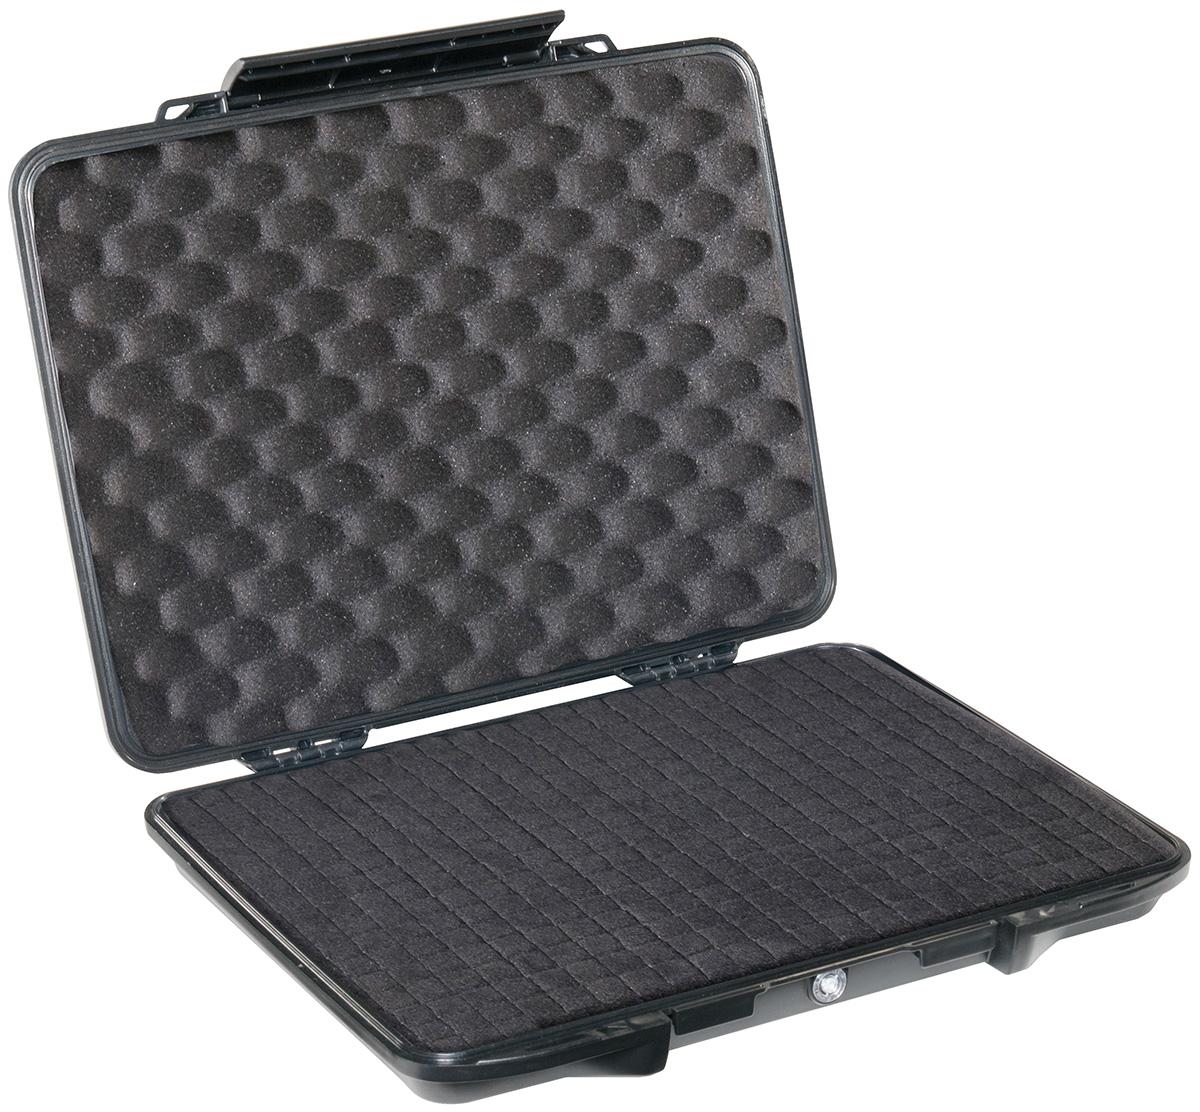 pelican peli products 1085 tough waterproof laptop lifetime case